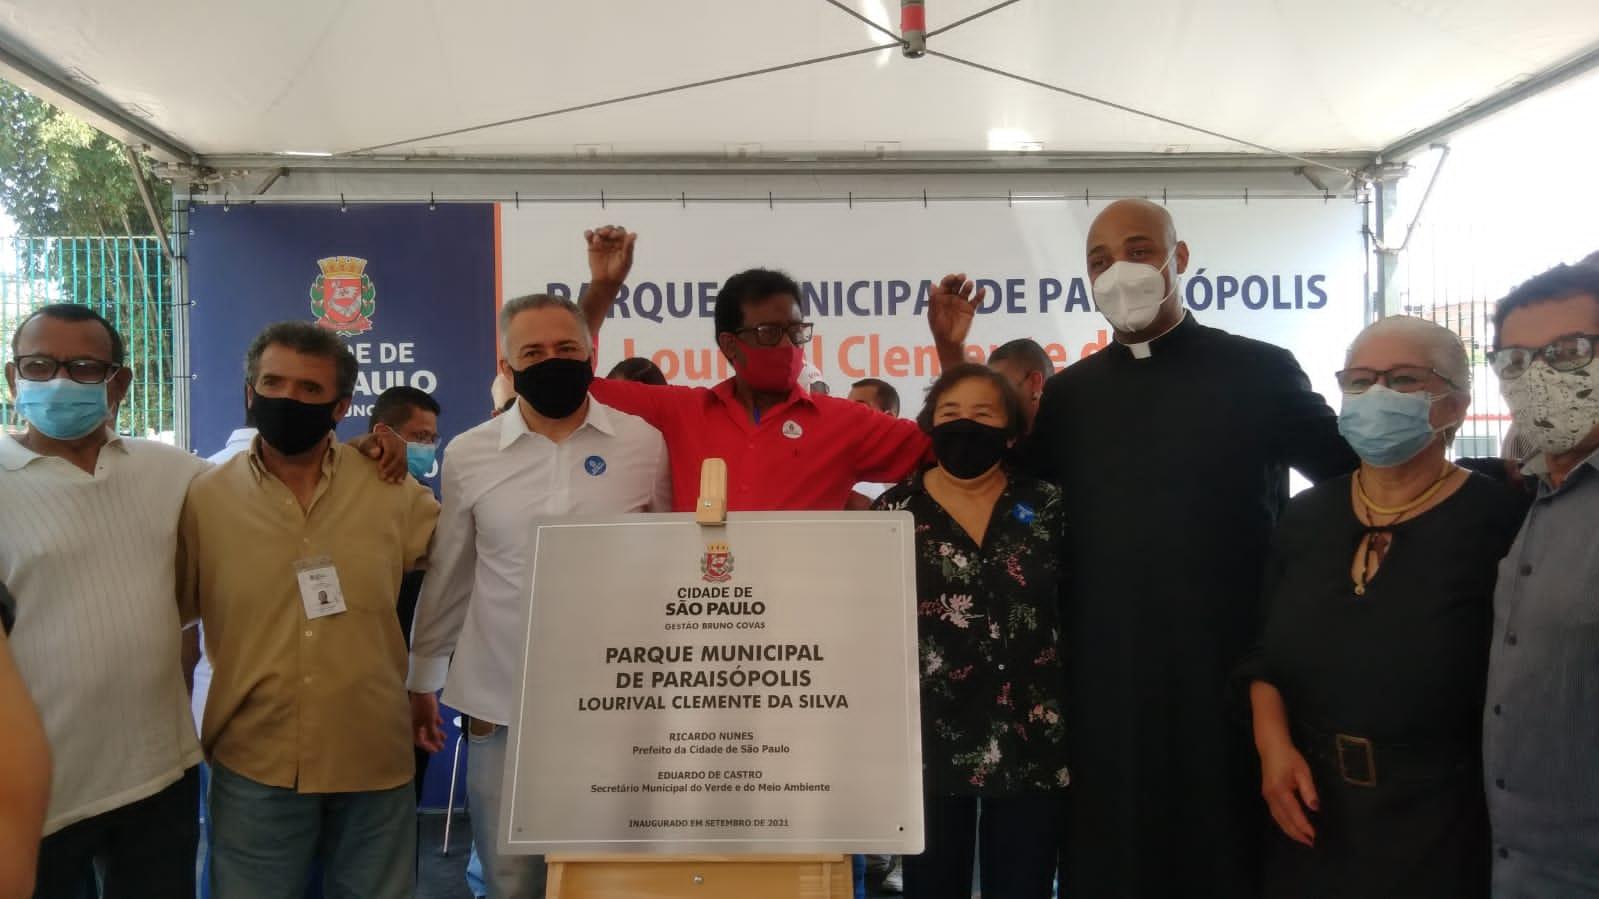 Parque Paraisópolis, fruto da luta da comunidade, é aberto ao público